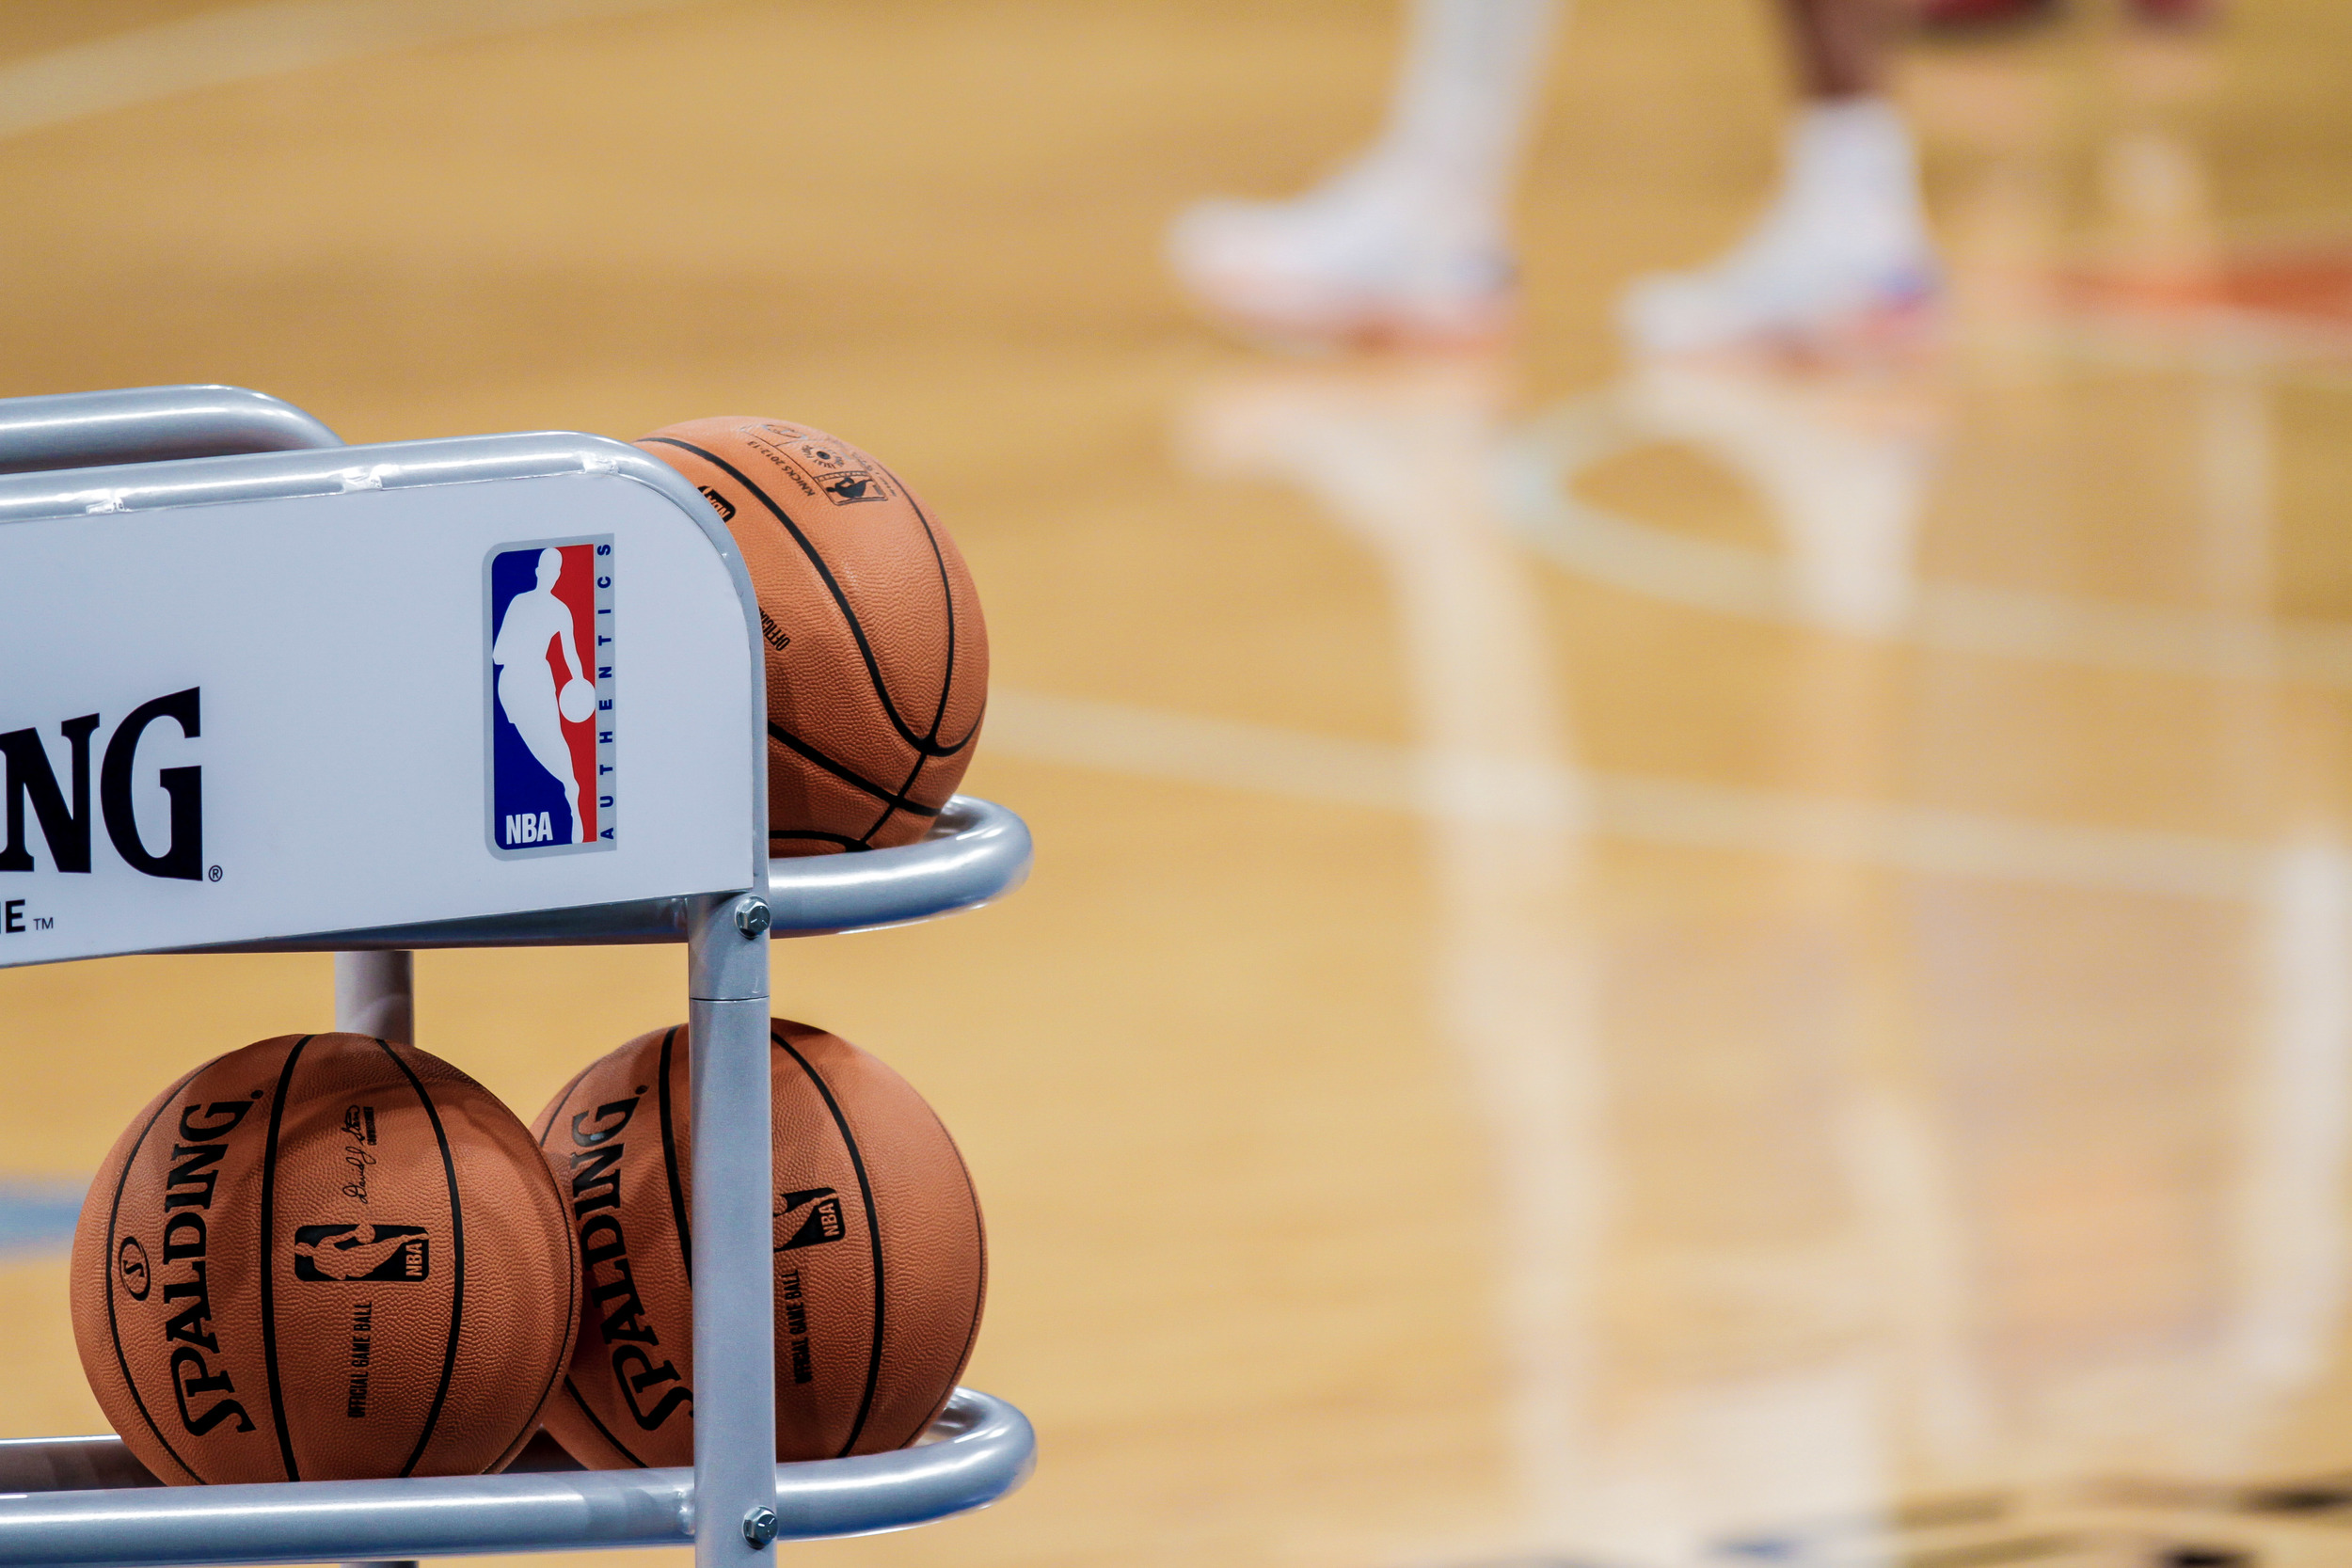 NY-KnicksPractice-BallRack-lowres-1.jpg